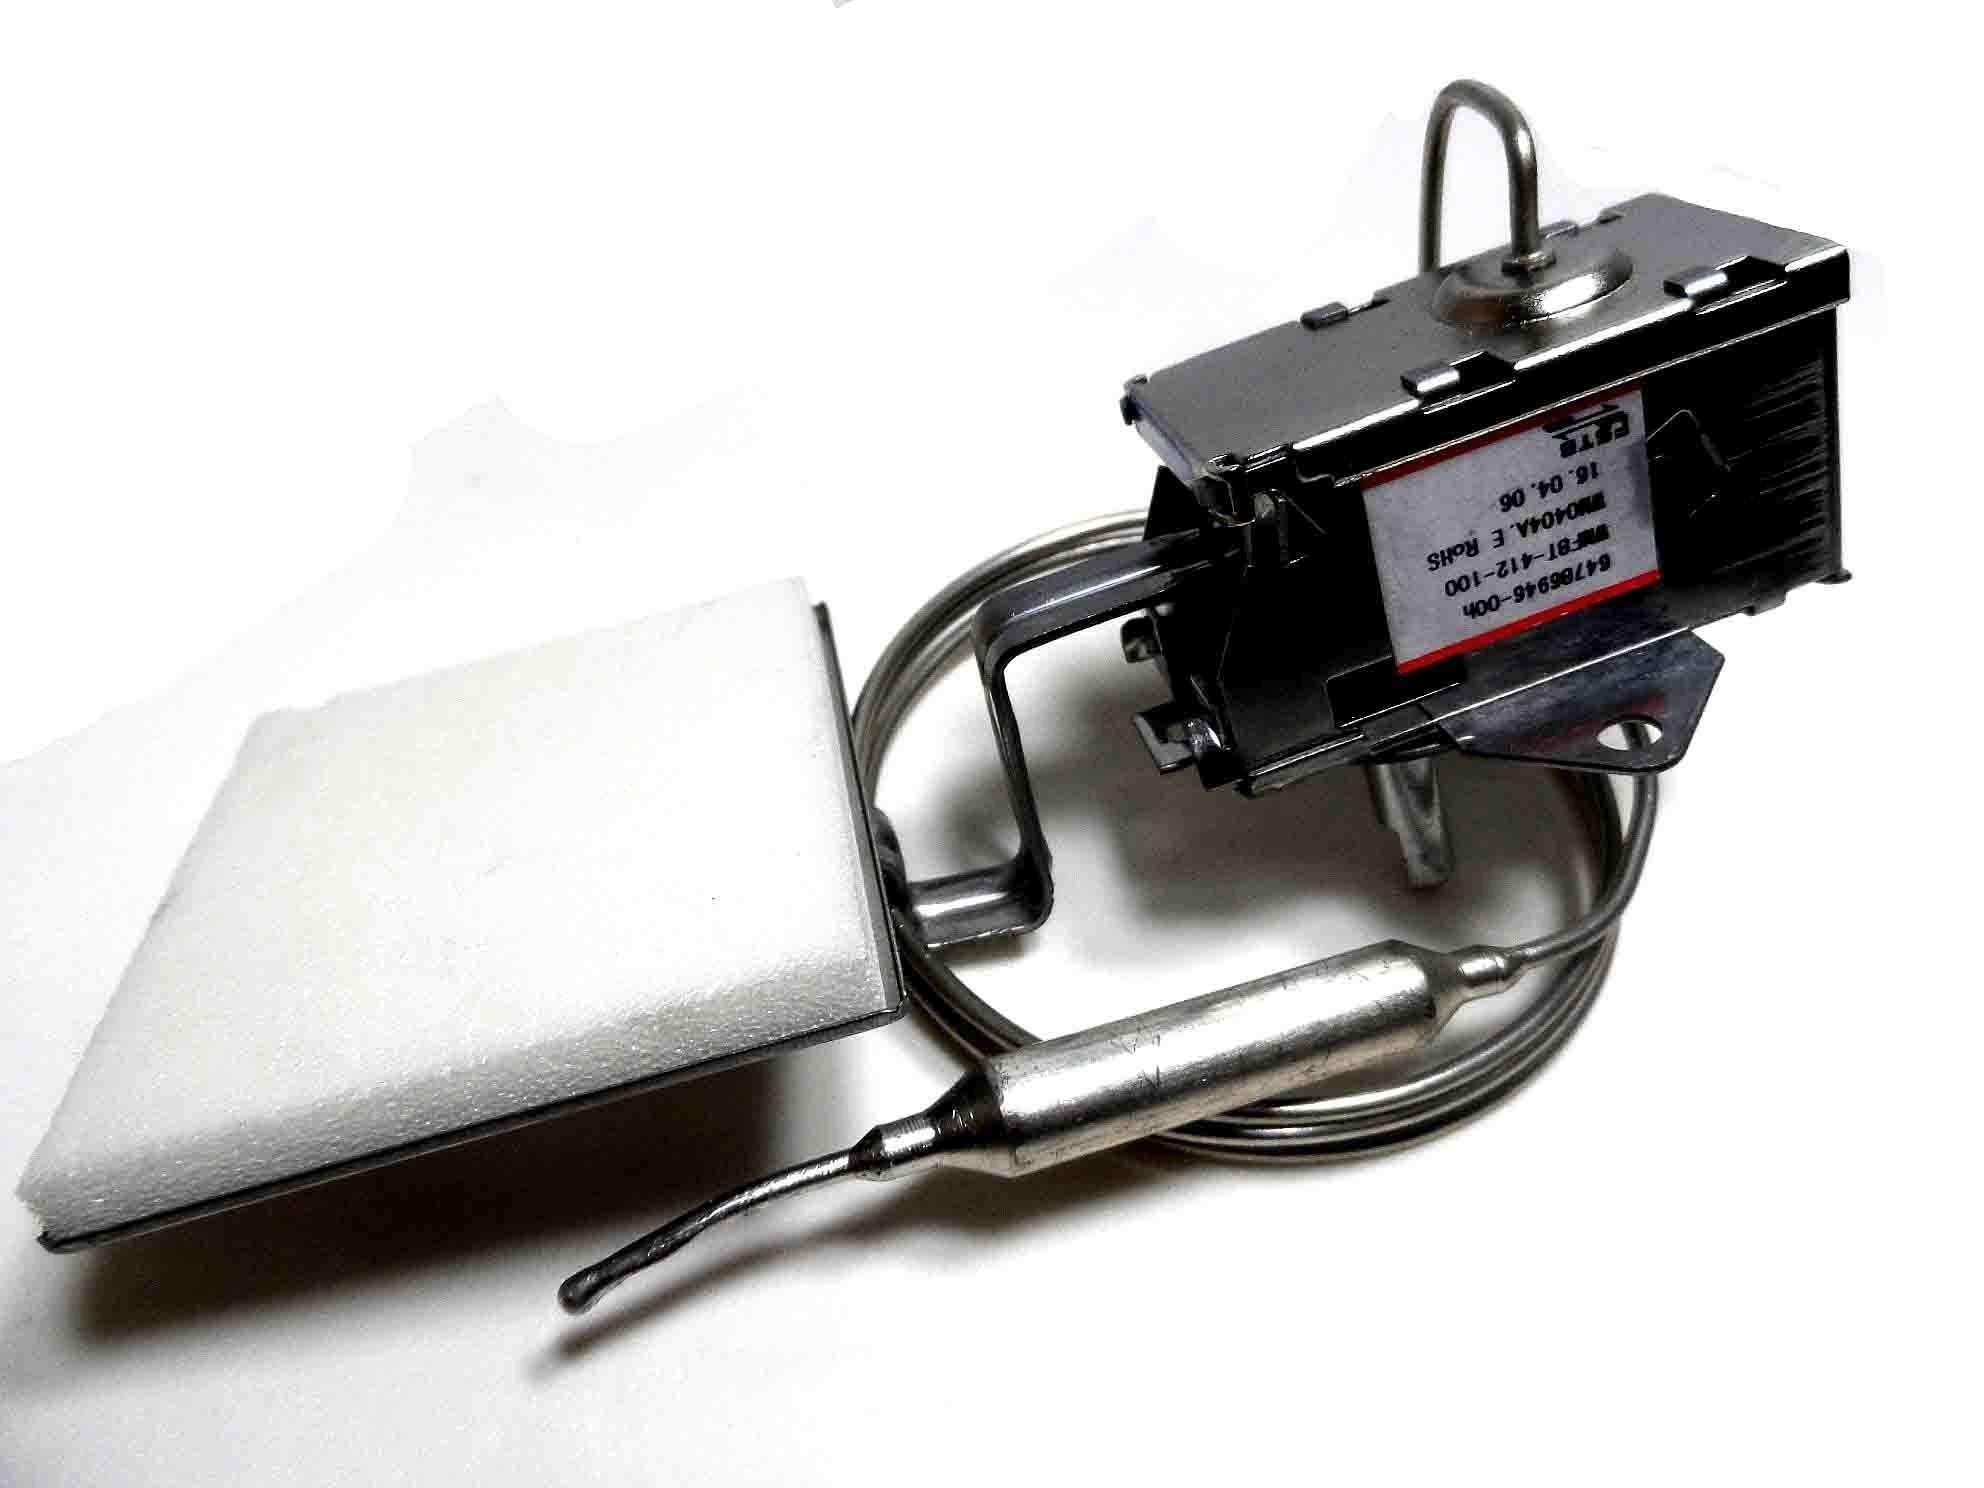 Termostato Damper Mecanico DF51/DF51X/DF52/DFW52/DW52X/DF80/DF80X/DF62/DFN52/DF52X/DF62X 64786946